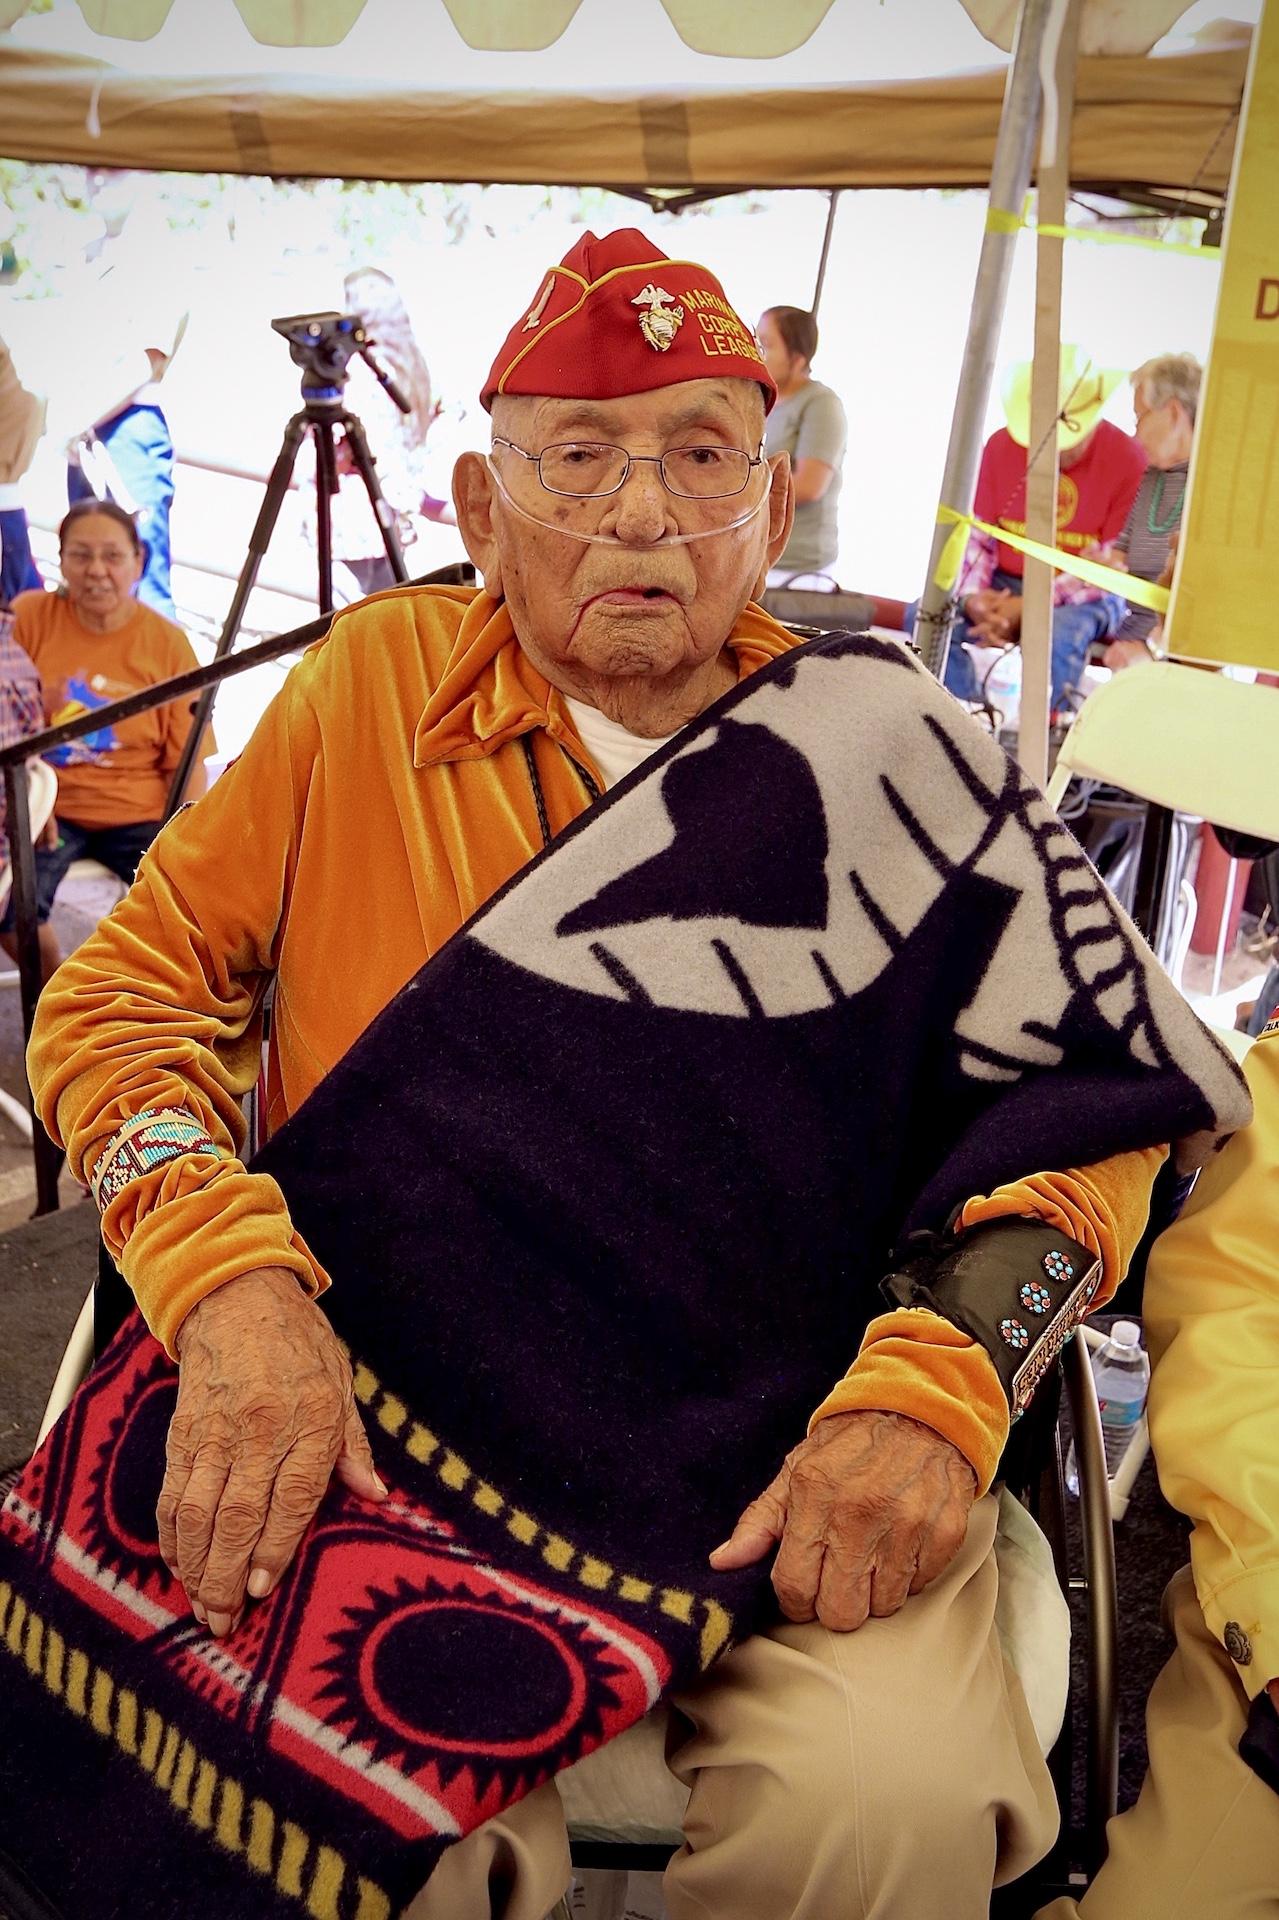 Udall Honors Navajo Code Talker Joe Vandever, Sr. in Speech in Congressional Record